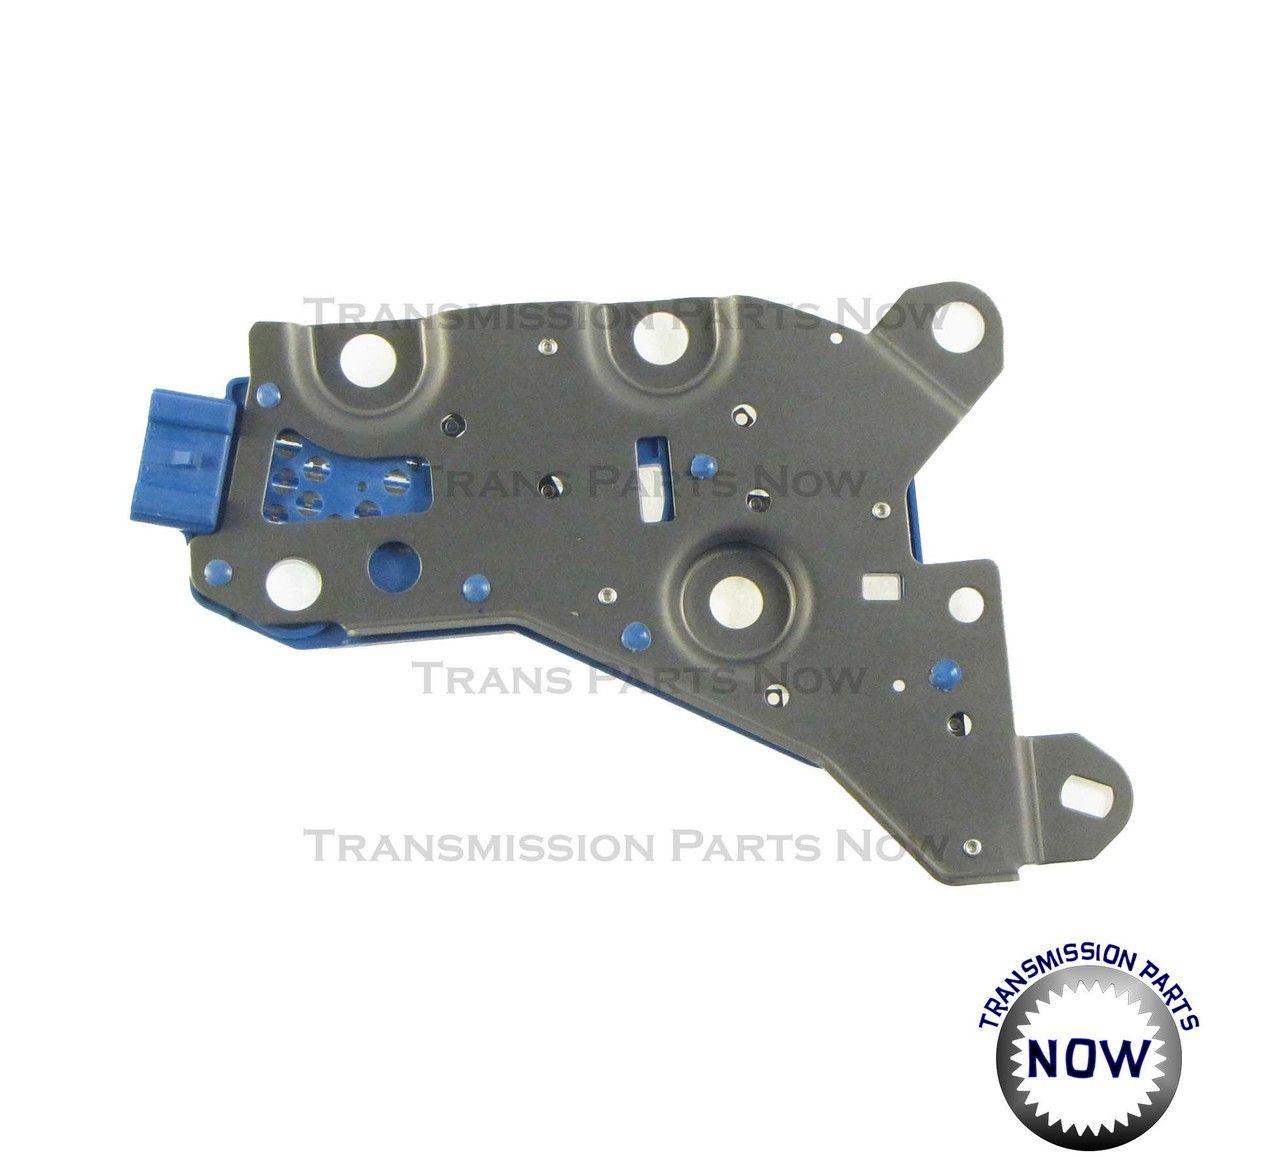 Allison Pressure switch manifold, fix your pressure switch